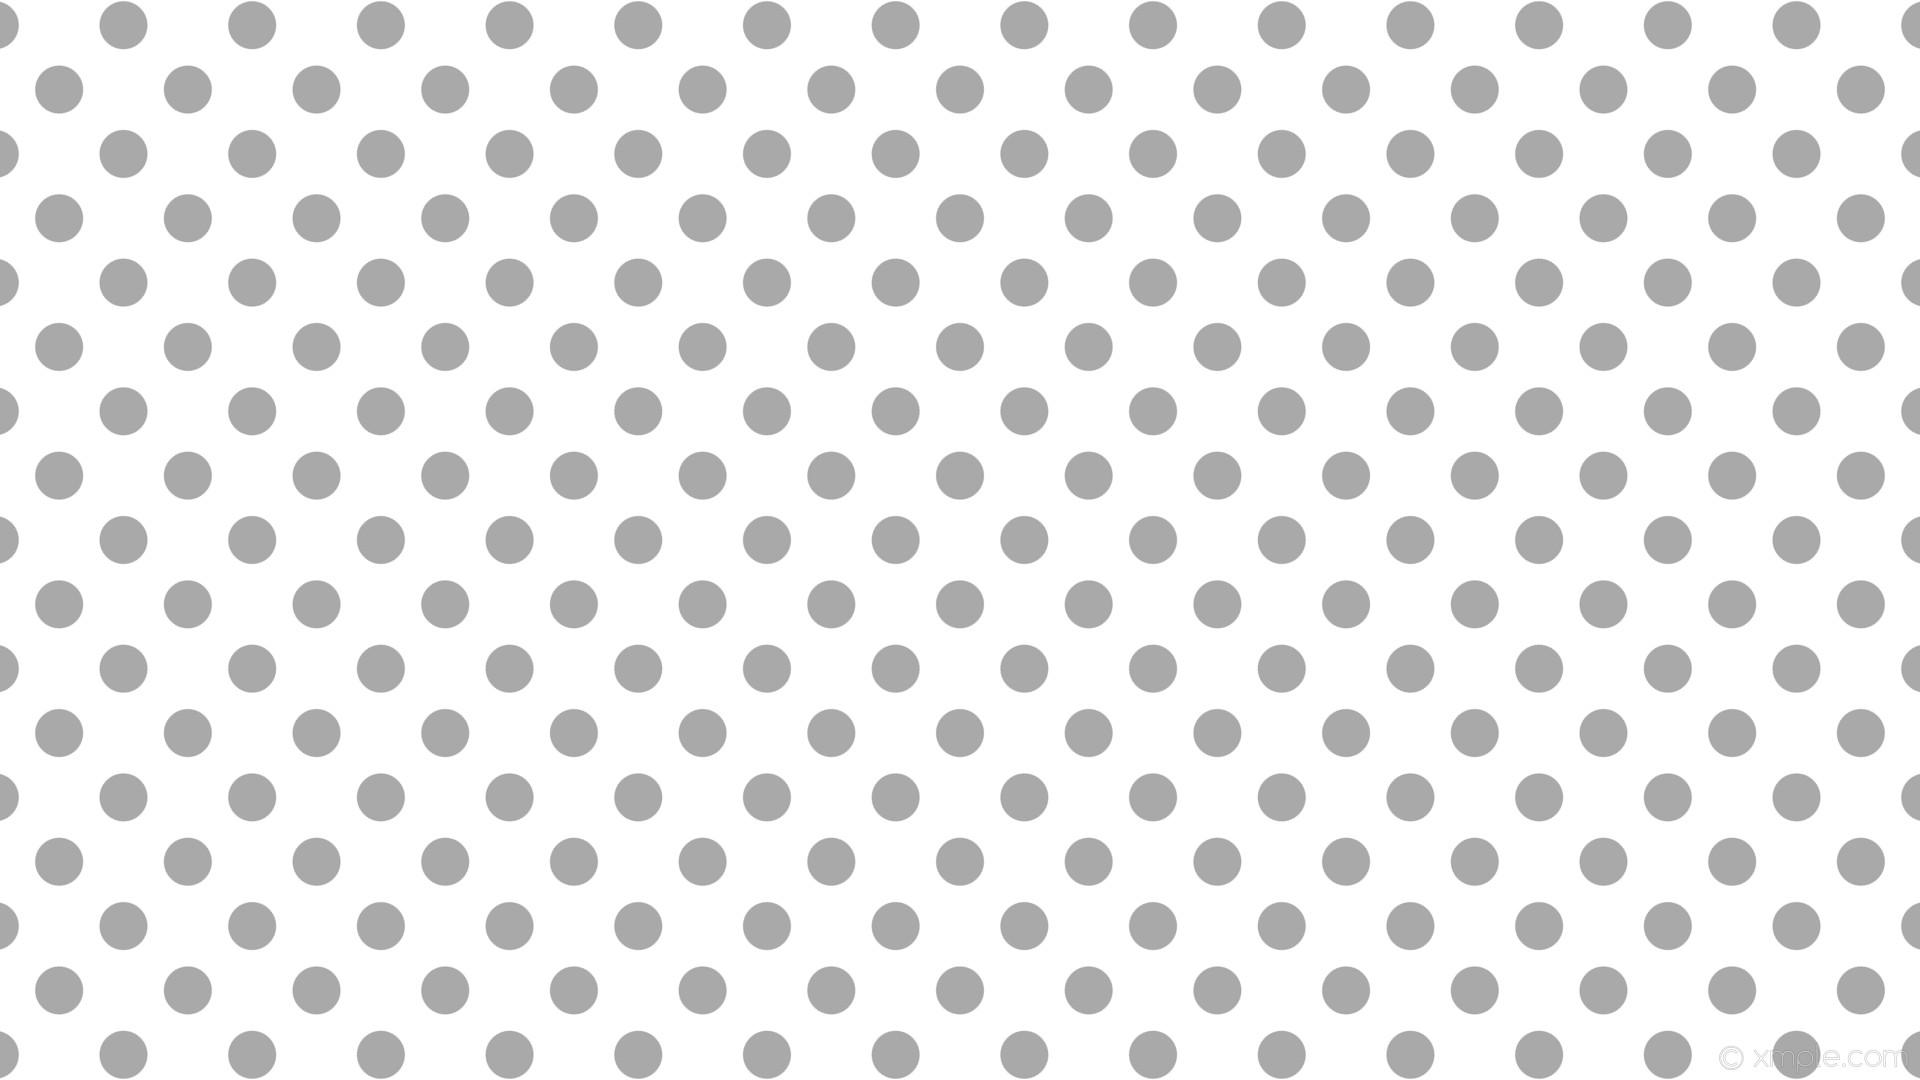 White And Grey Polka Dot Wallpaper